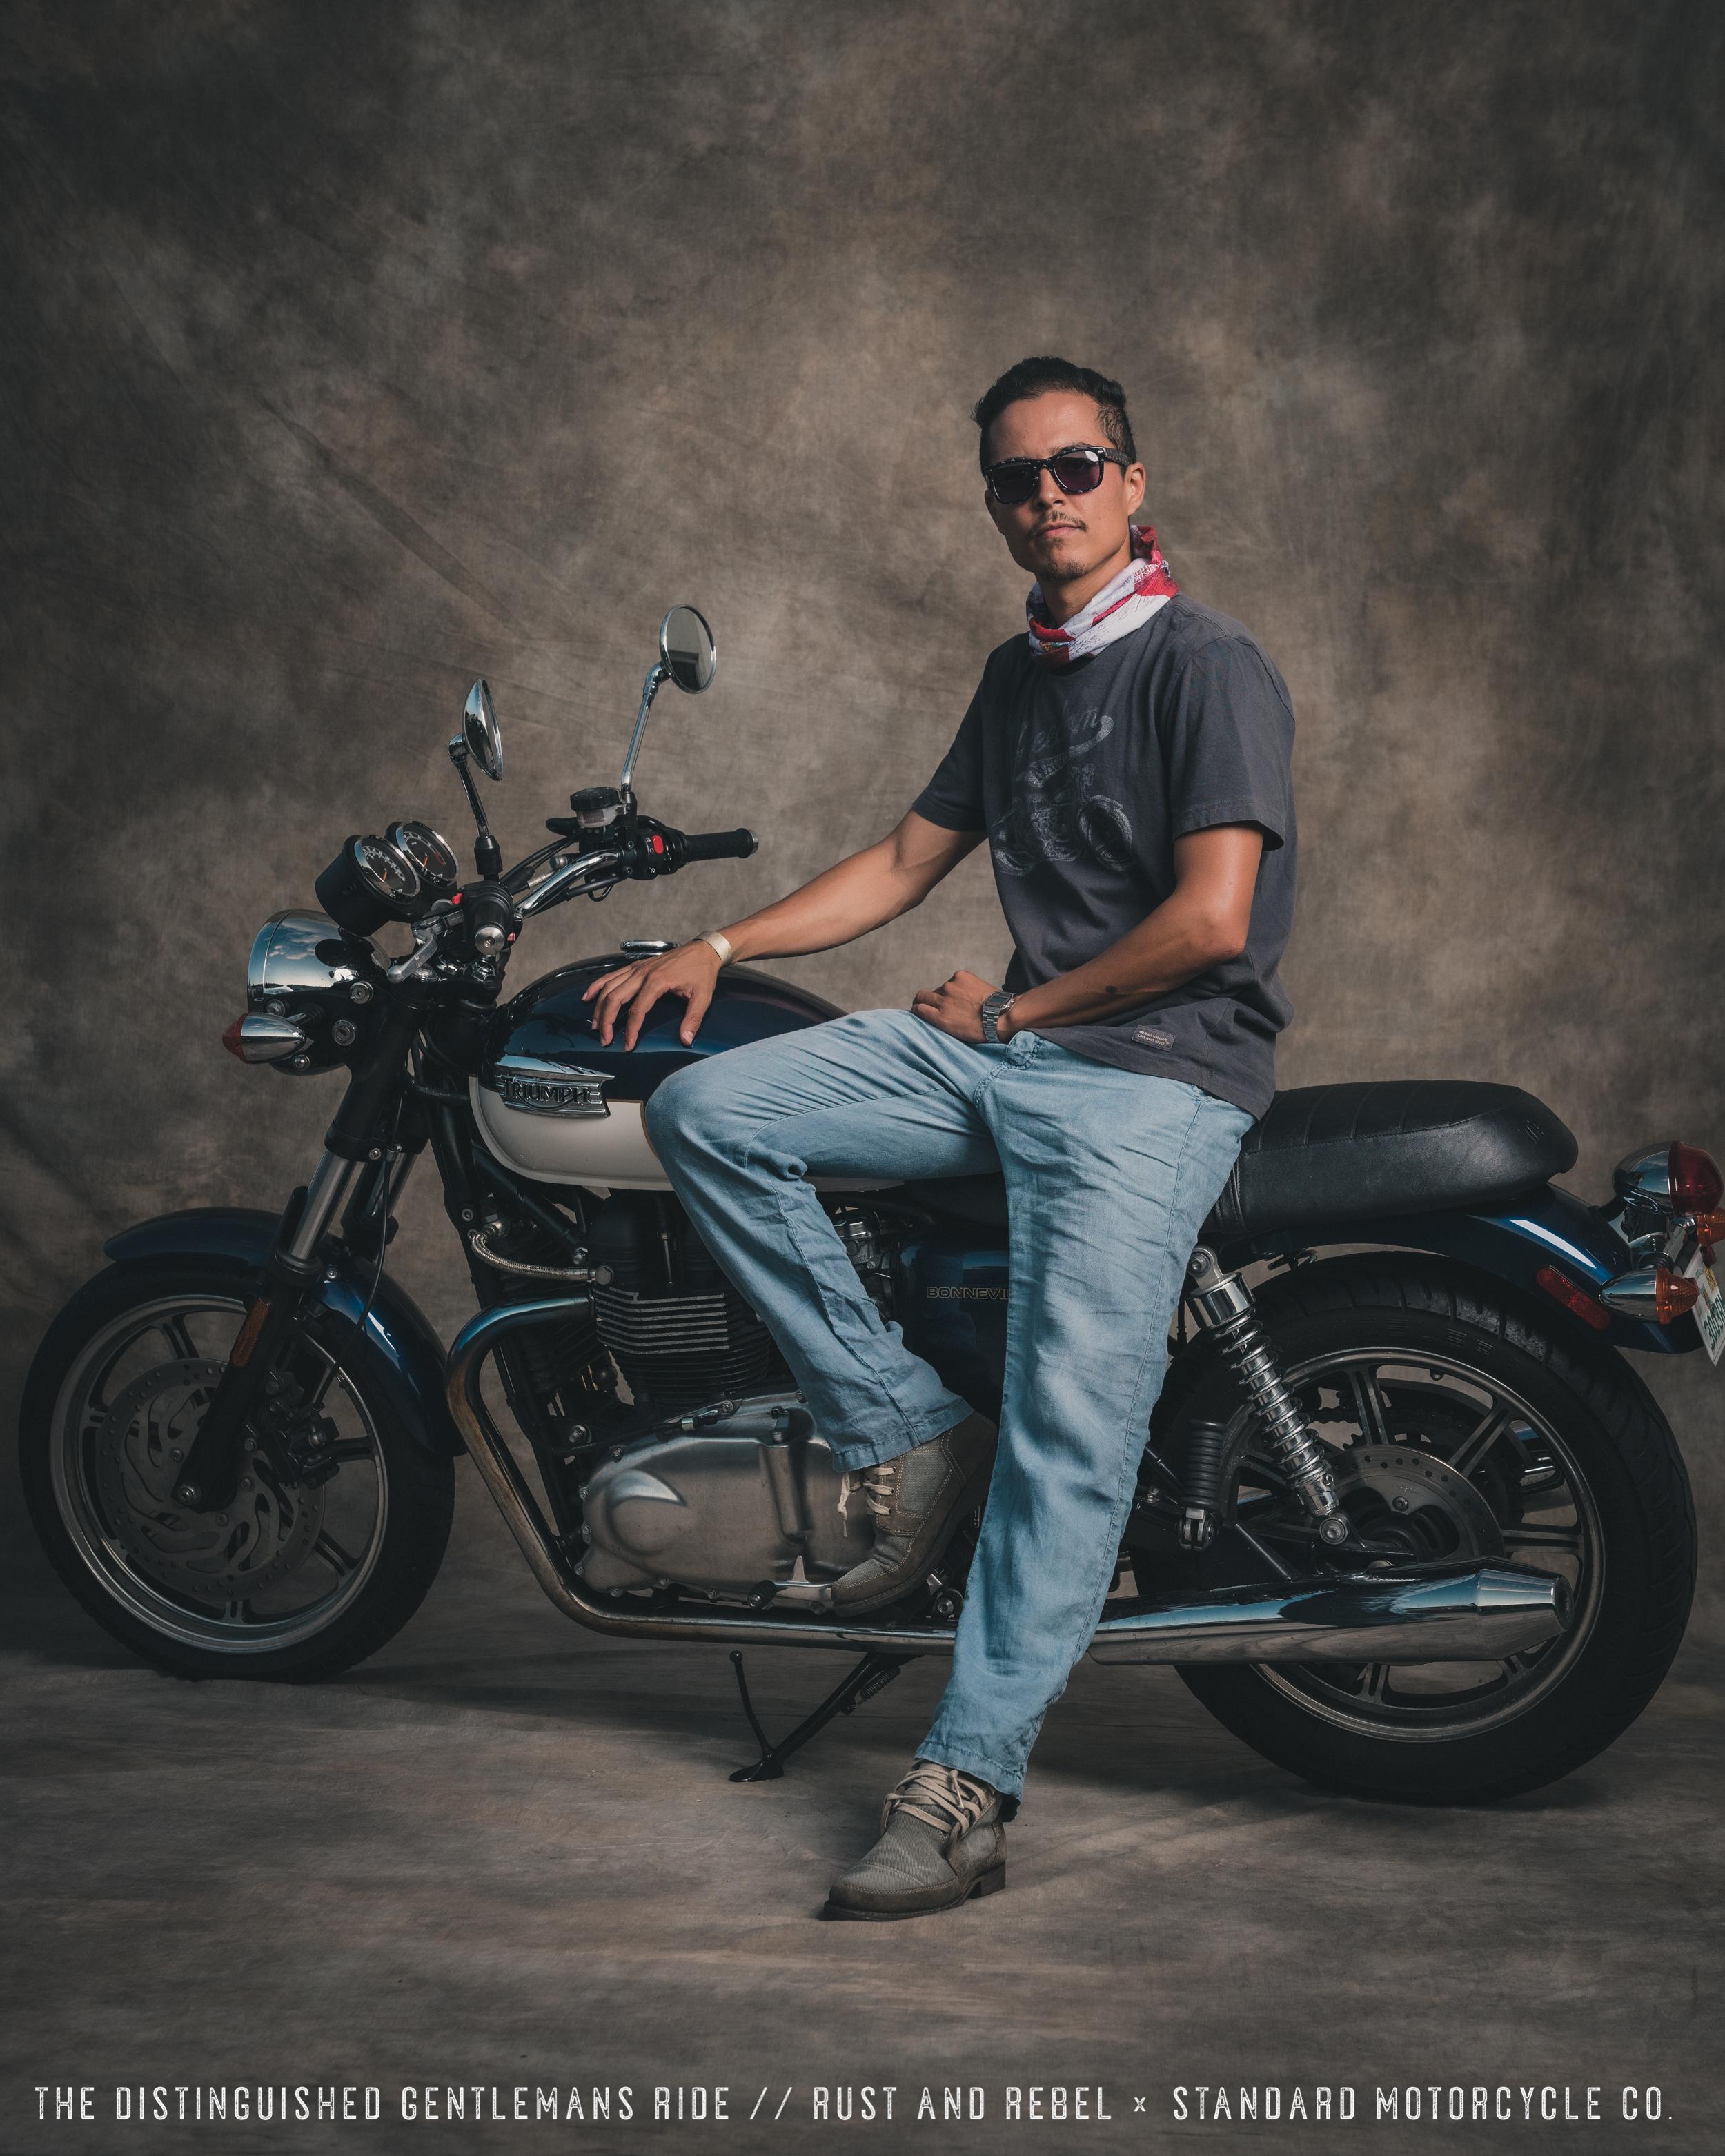 The Distinguished Gentleman's Ride 2019 [PEOPLE - PHOTO BY @MIKEDUNNUSA] - 0127.jpg